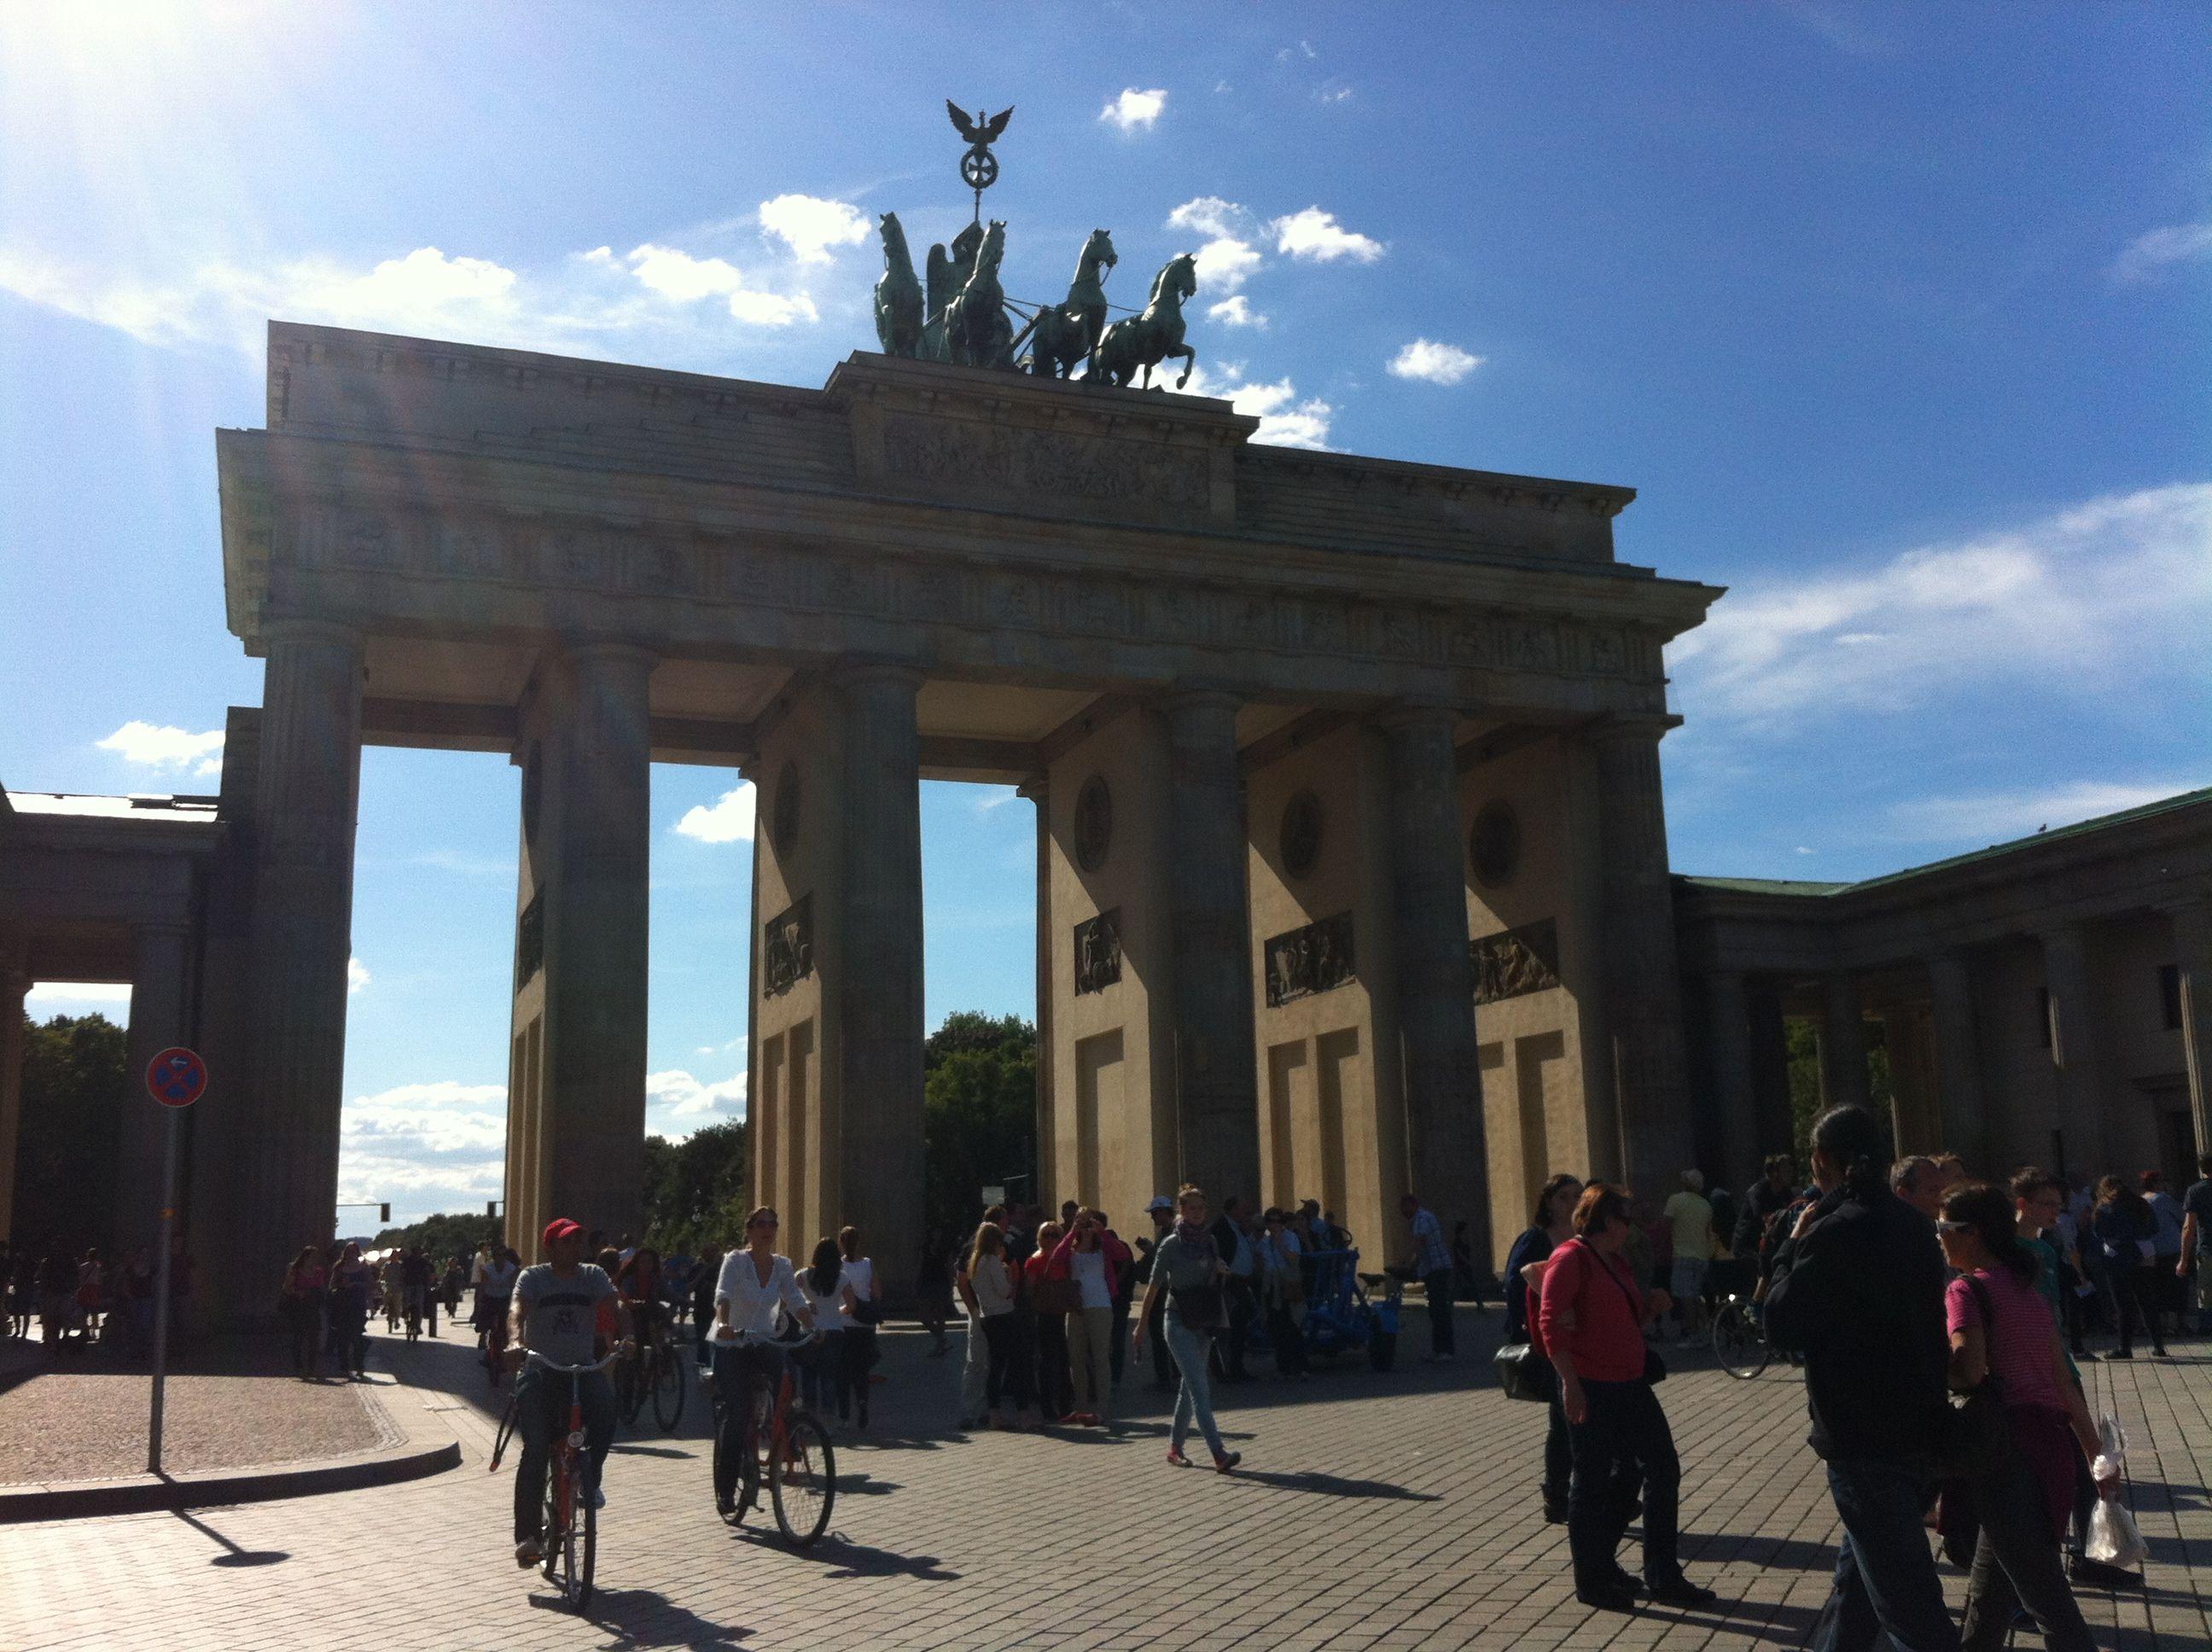 La puerta...Berlín